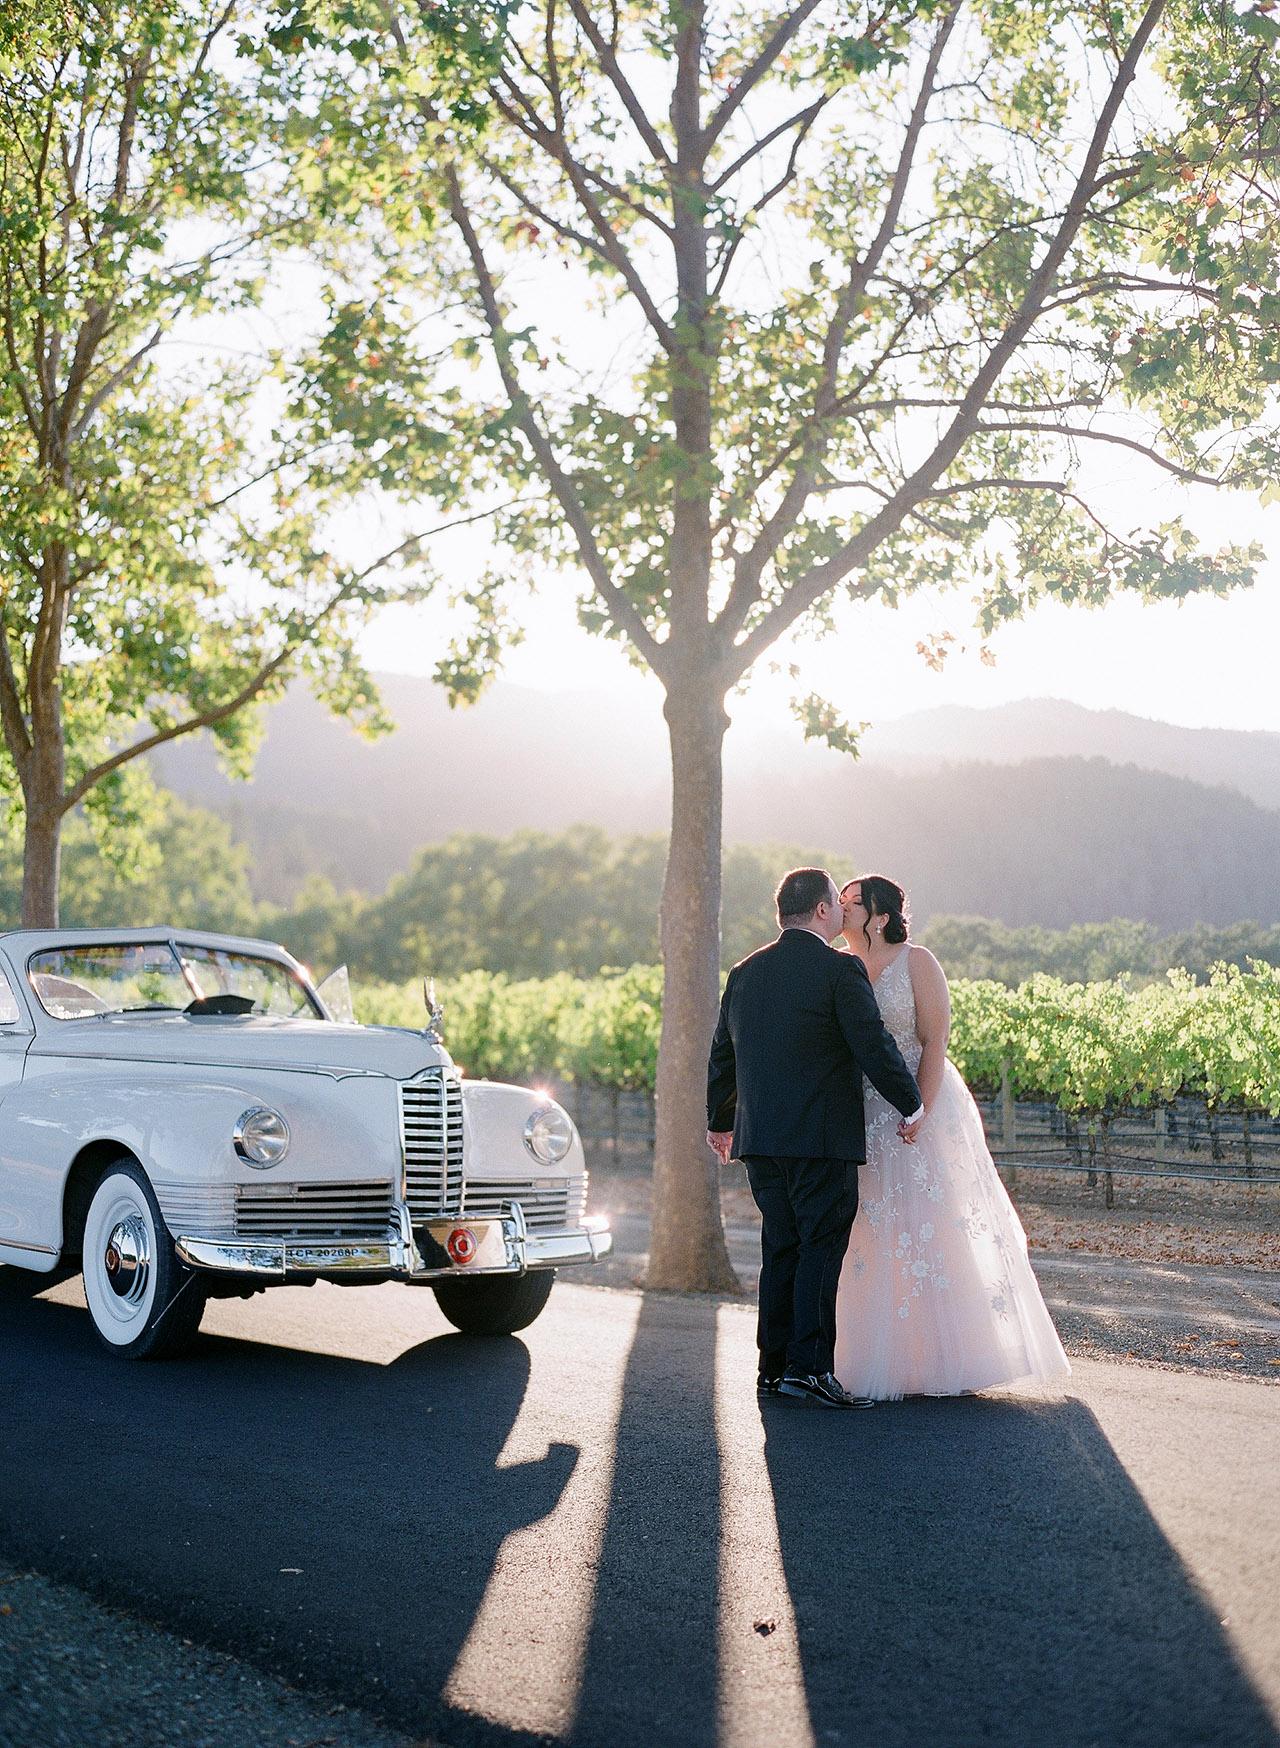 gillian tyler wedding couple vintage car